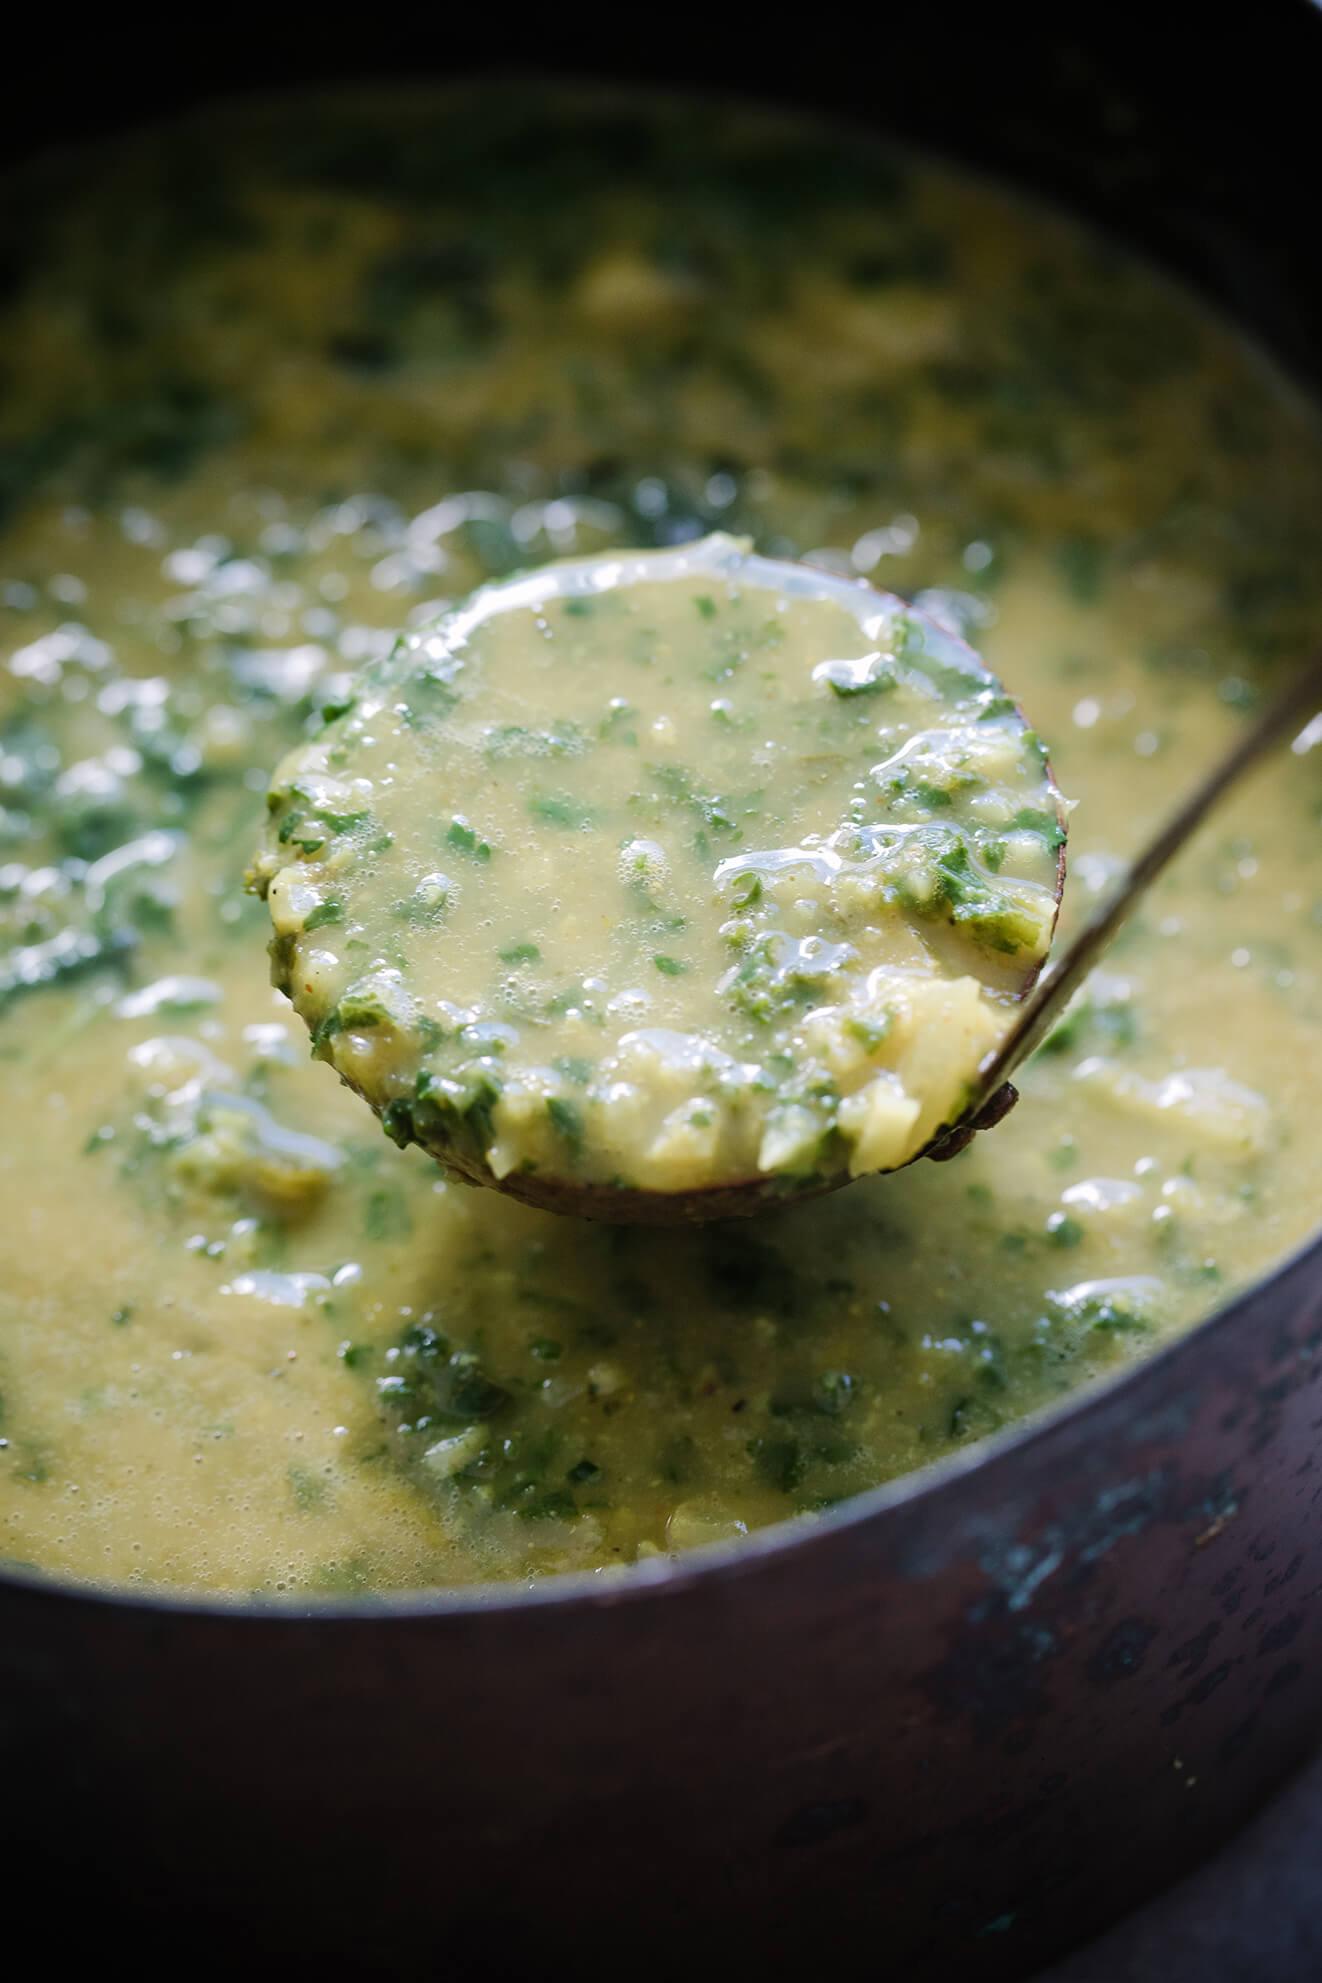 vegan cauliflower soup, Modern Food Stories, london food photographer